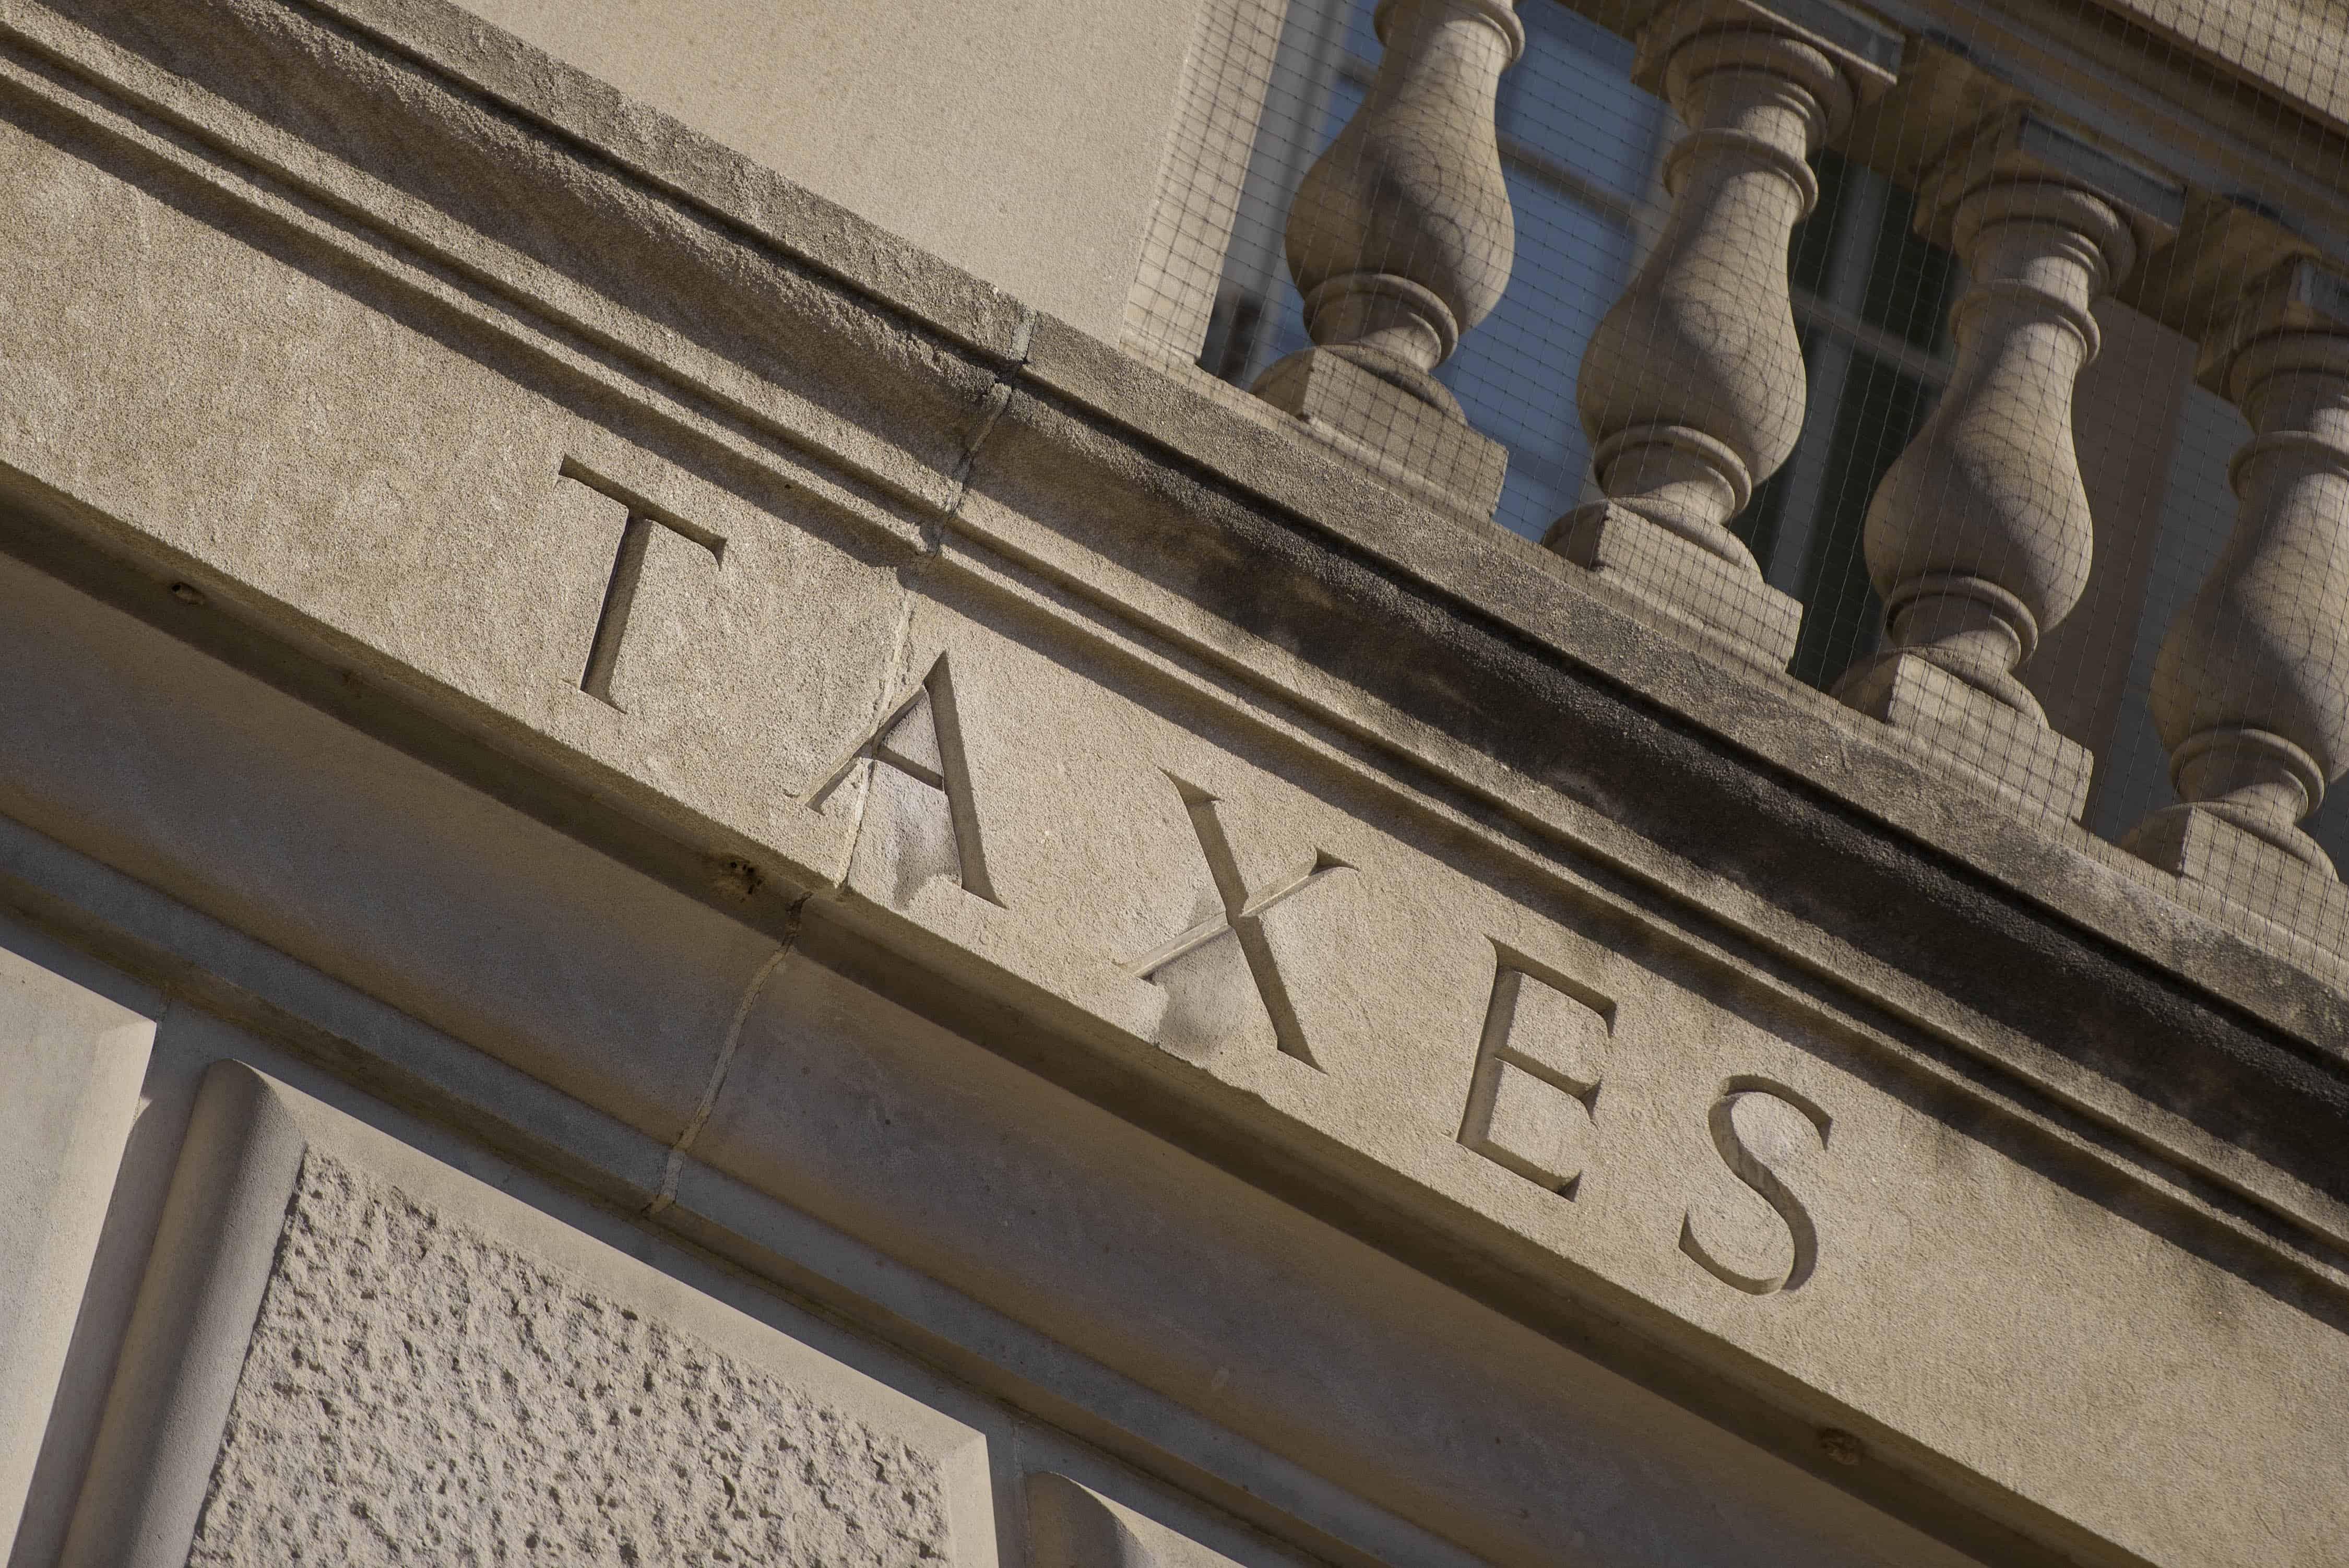 IRS headquarters in Washington, D.C. | Taxes | Advice